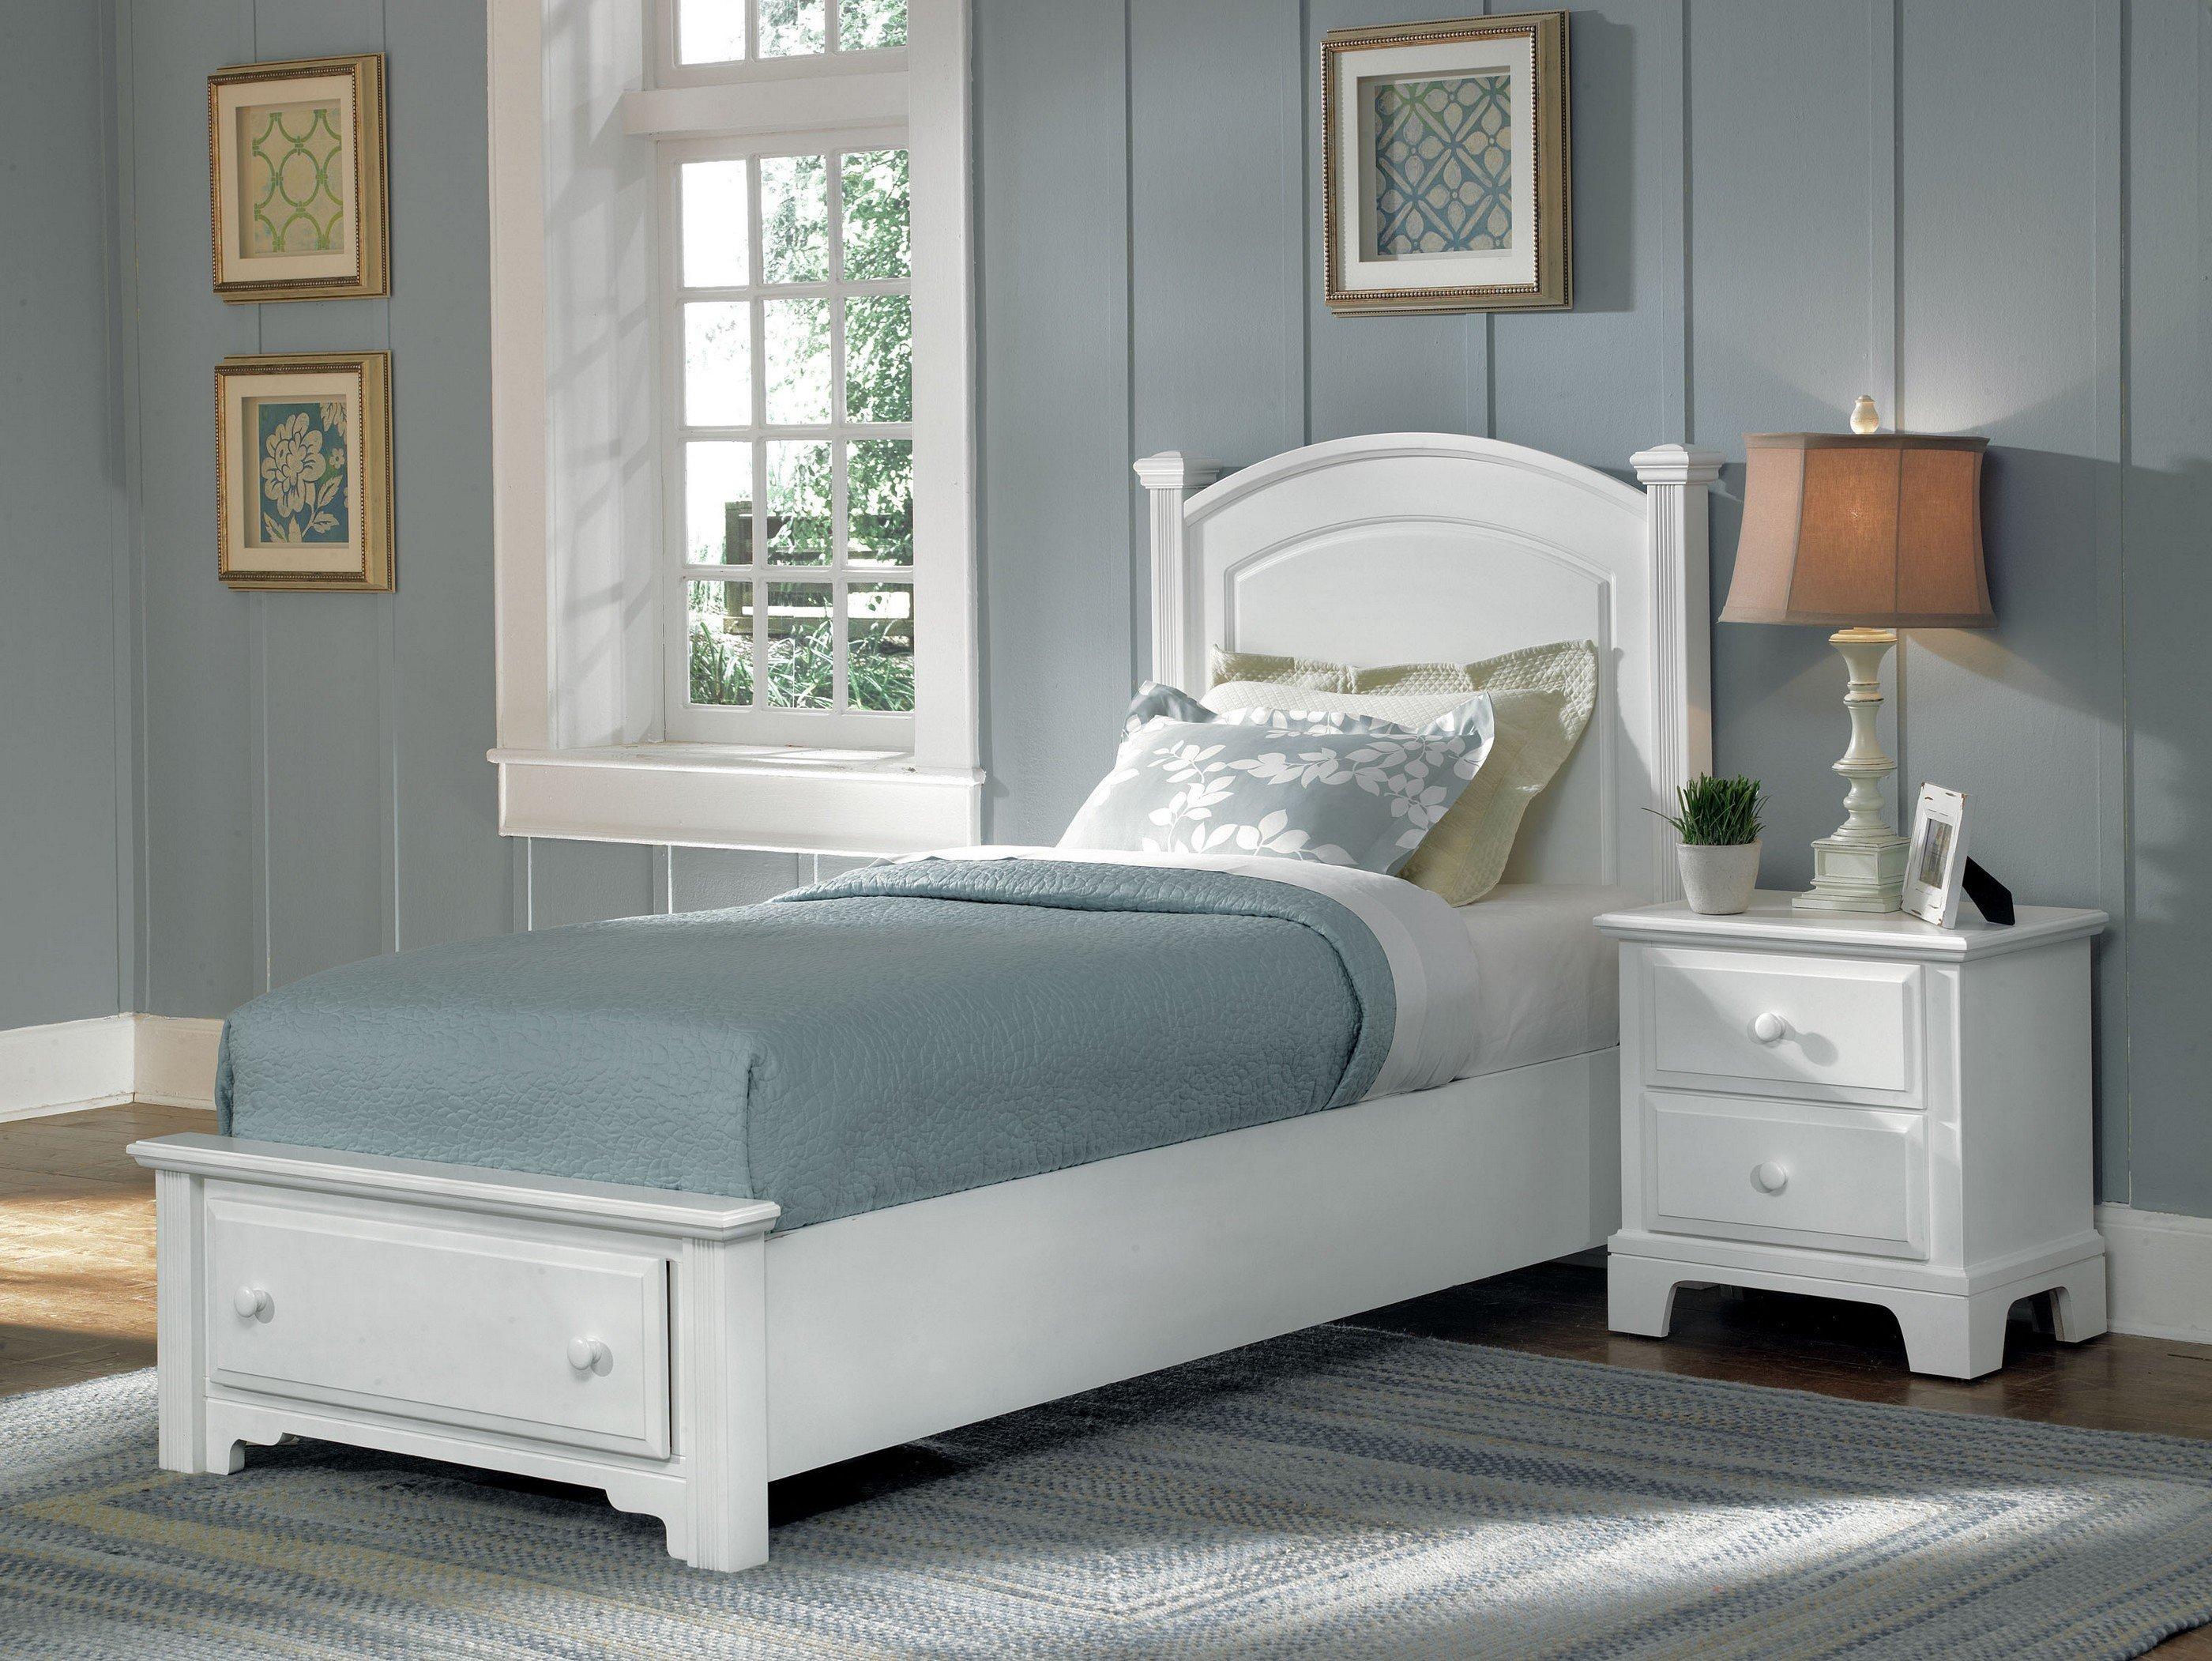 vaughan bassett hamilton franklin night stand with 2 drawers belfort furniture night stands. Black Bedroom Furniture Sets. Home Design Ideas